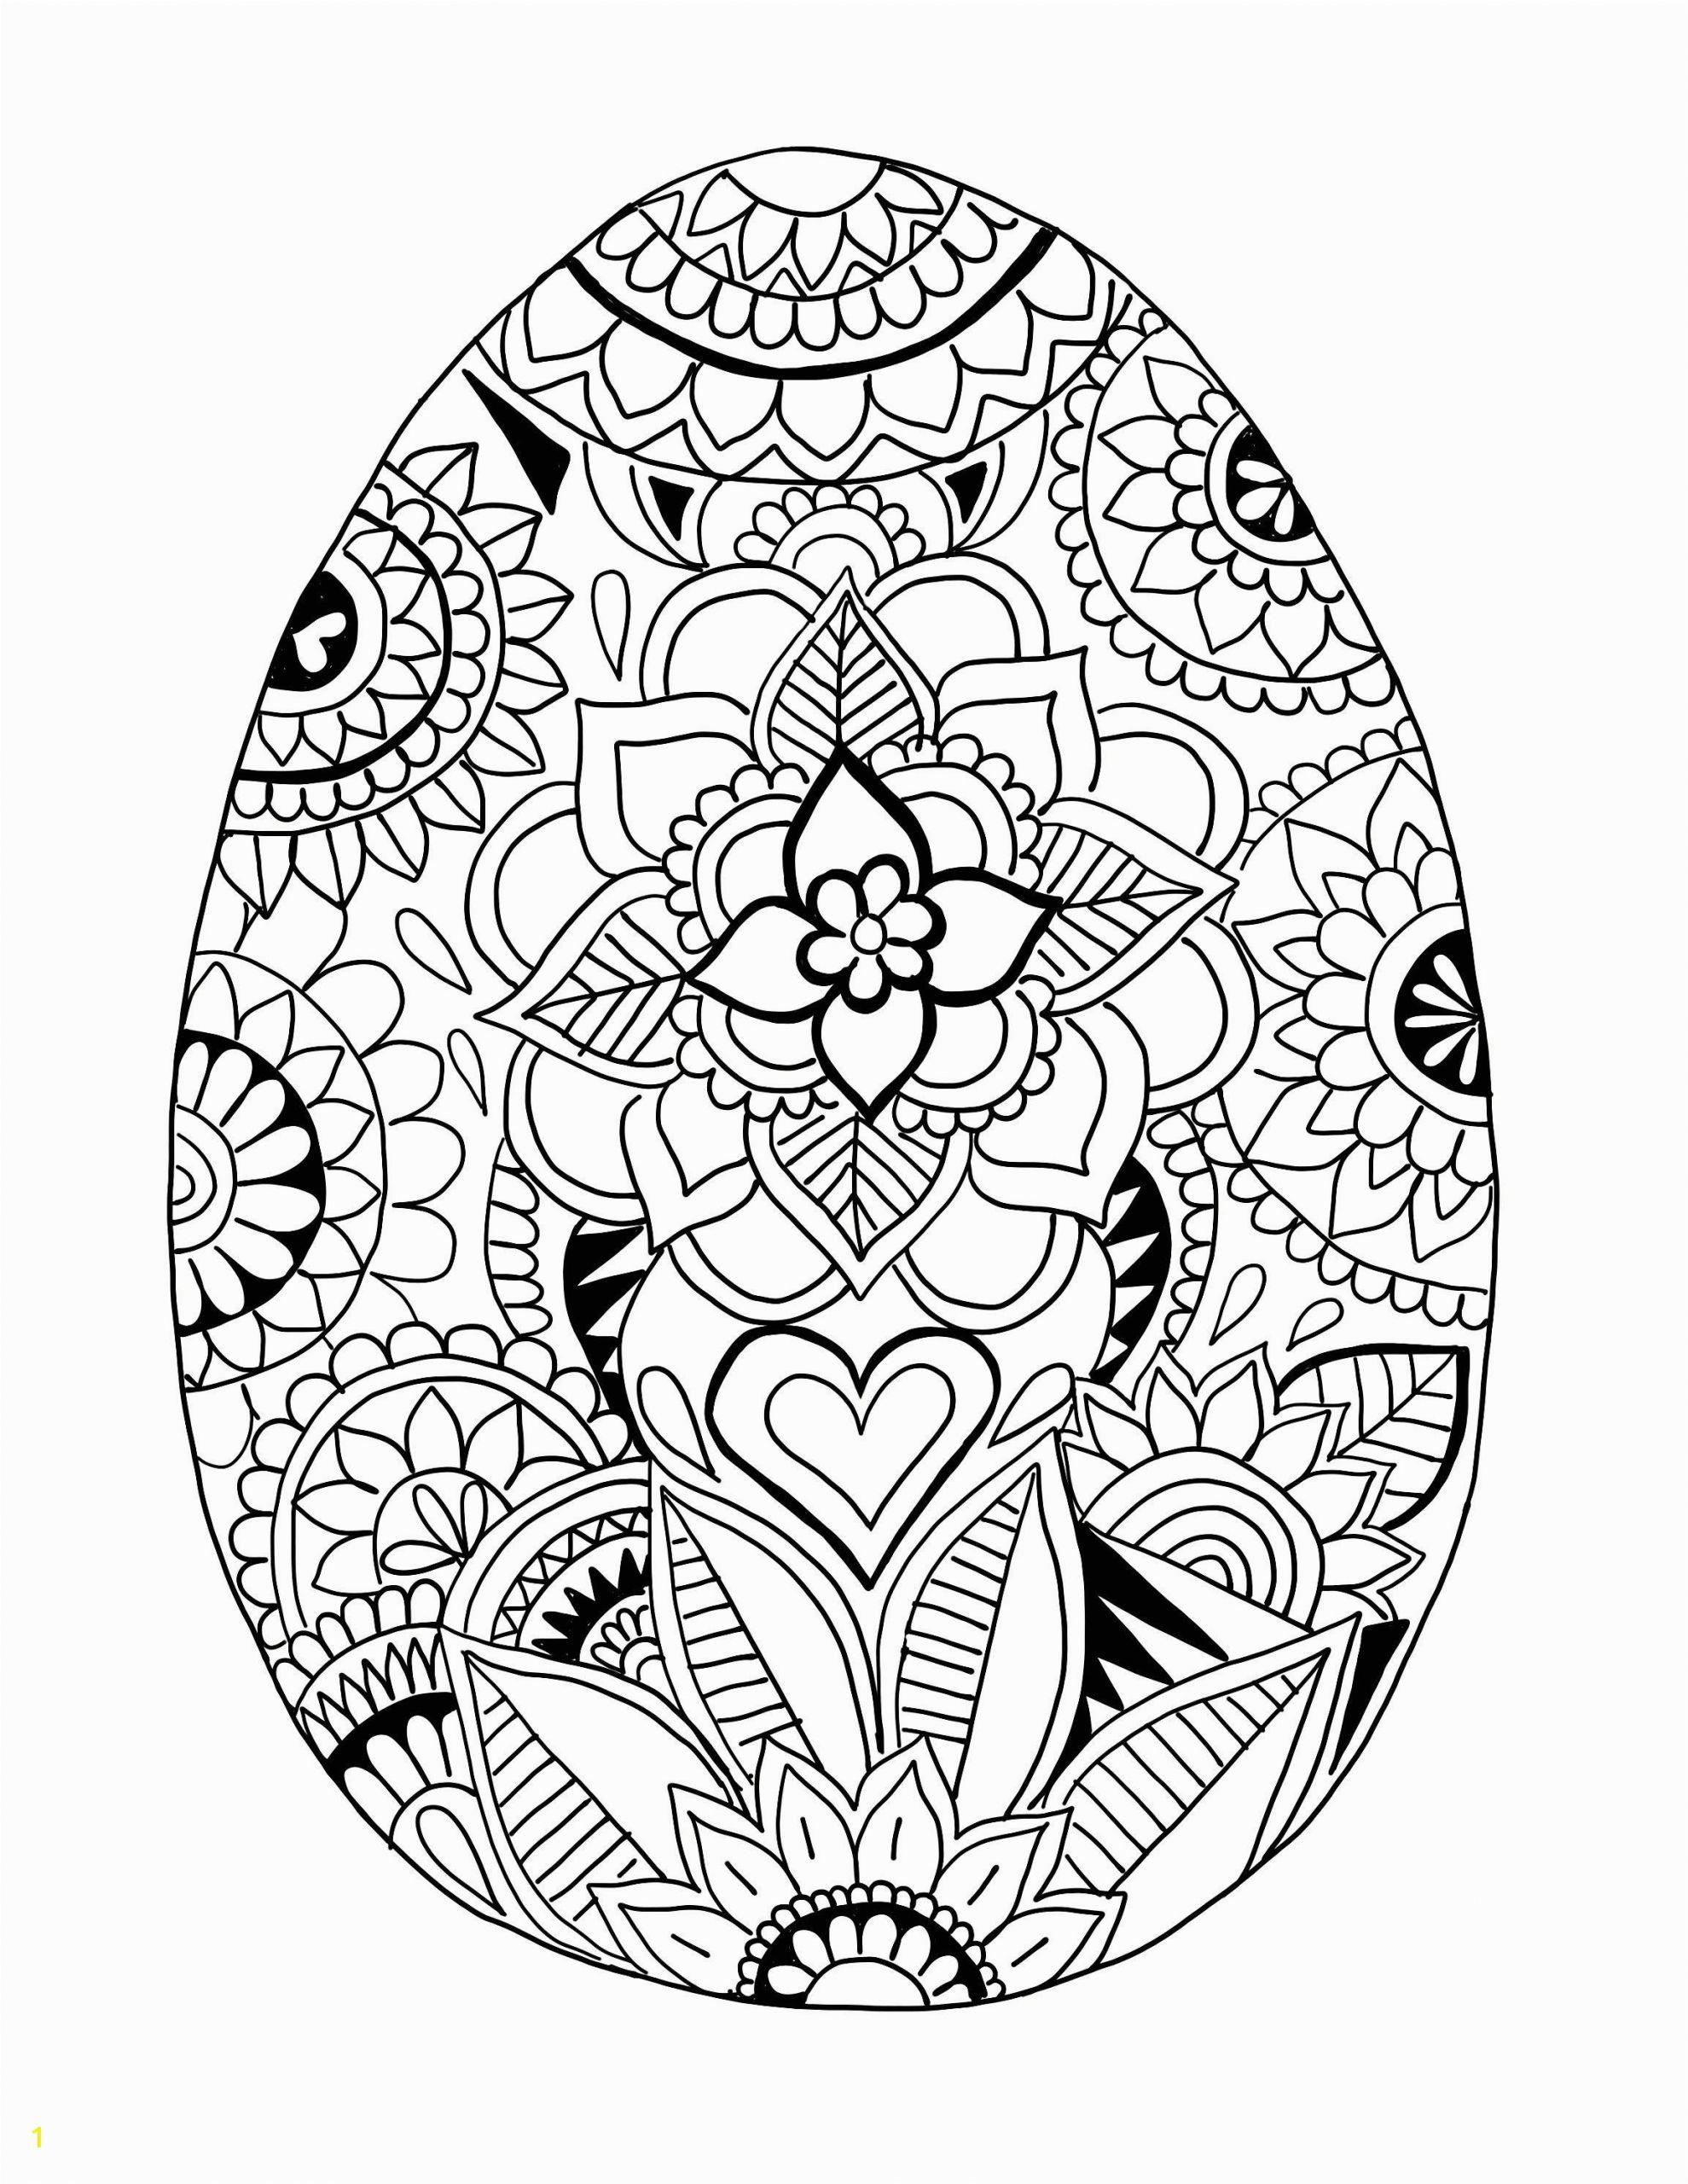 Coloring Pages Easter Eggs Printable Pin Auf Ausmalbilder Mandala